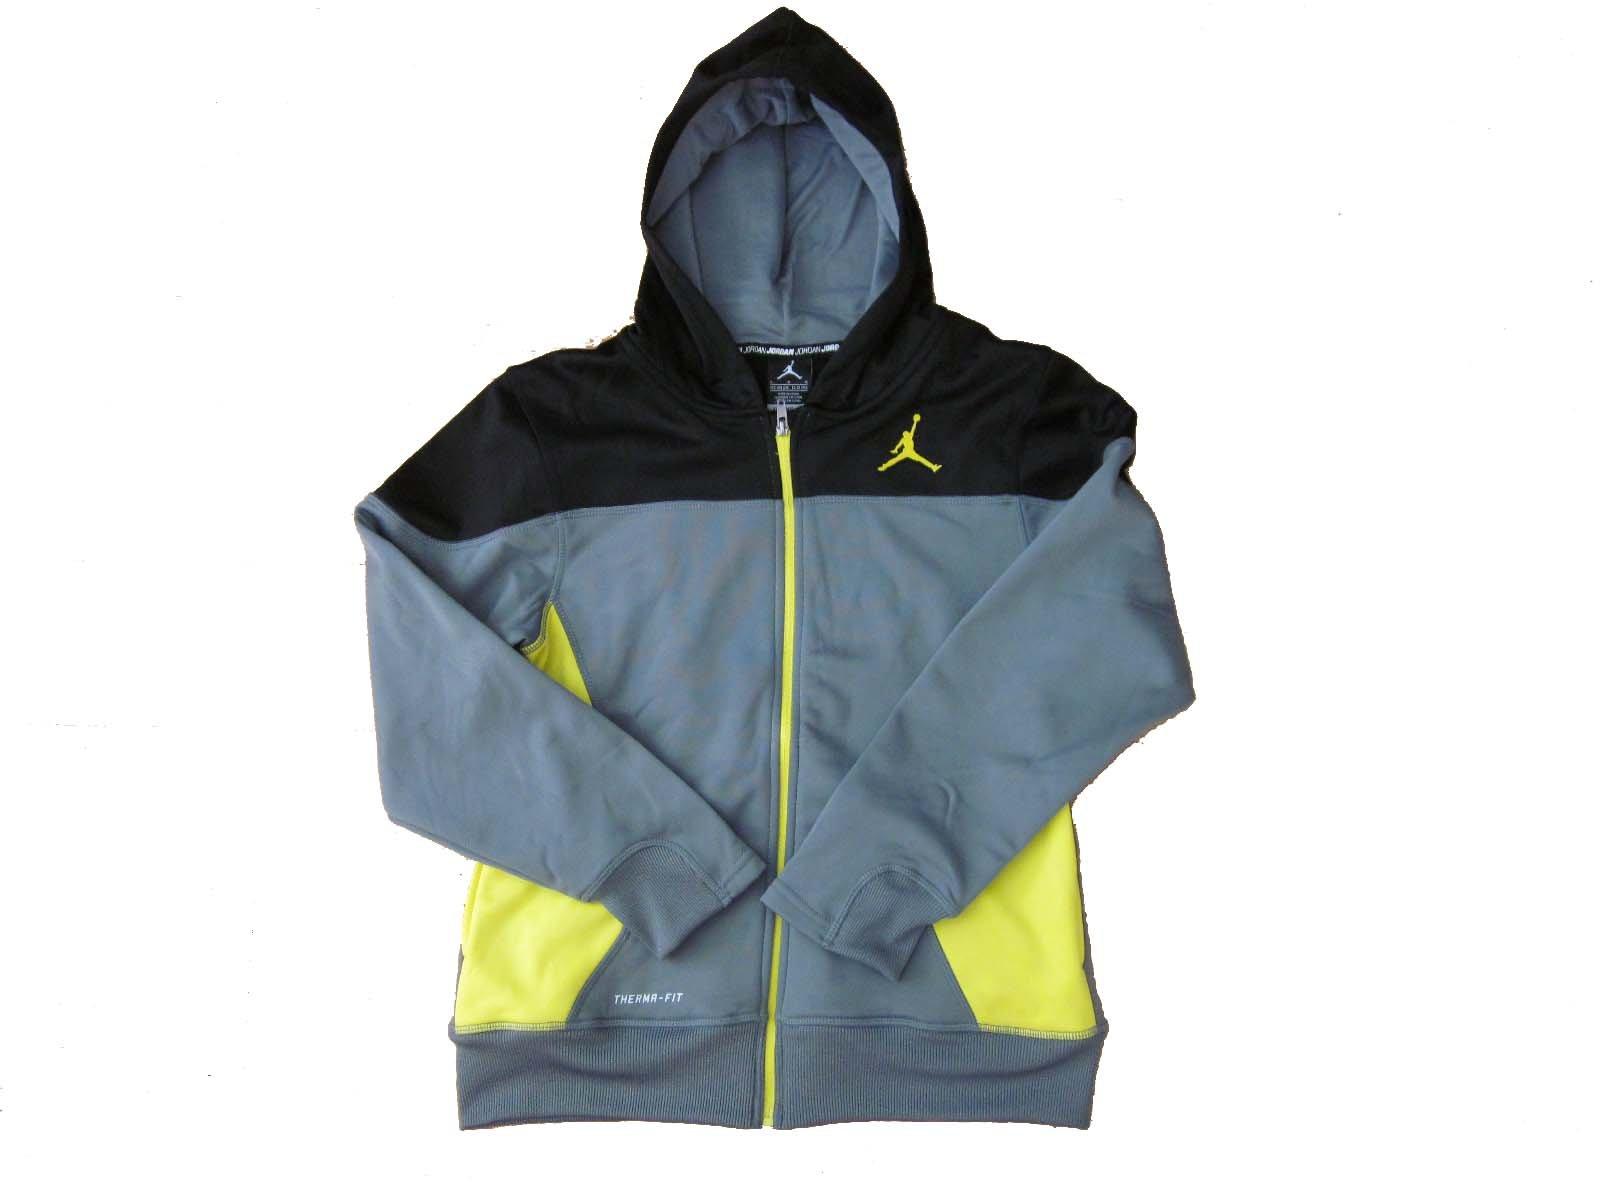 Boys Youth Jordan Therma Fit Zippered Hoodie (X-Large, Grey/Yellow/Black) by Jordan